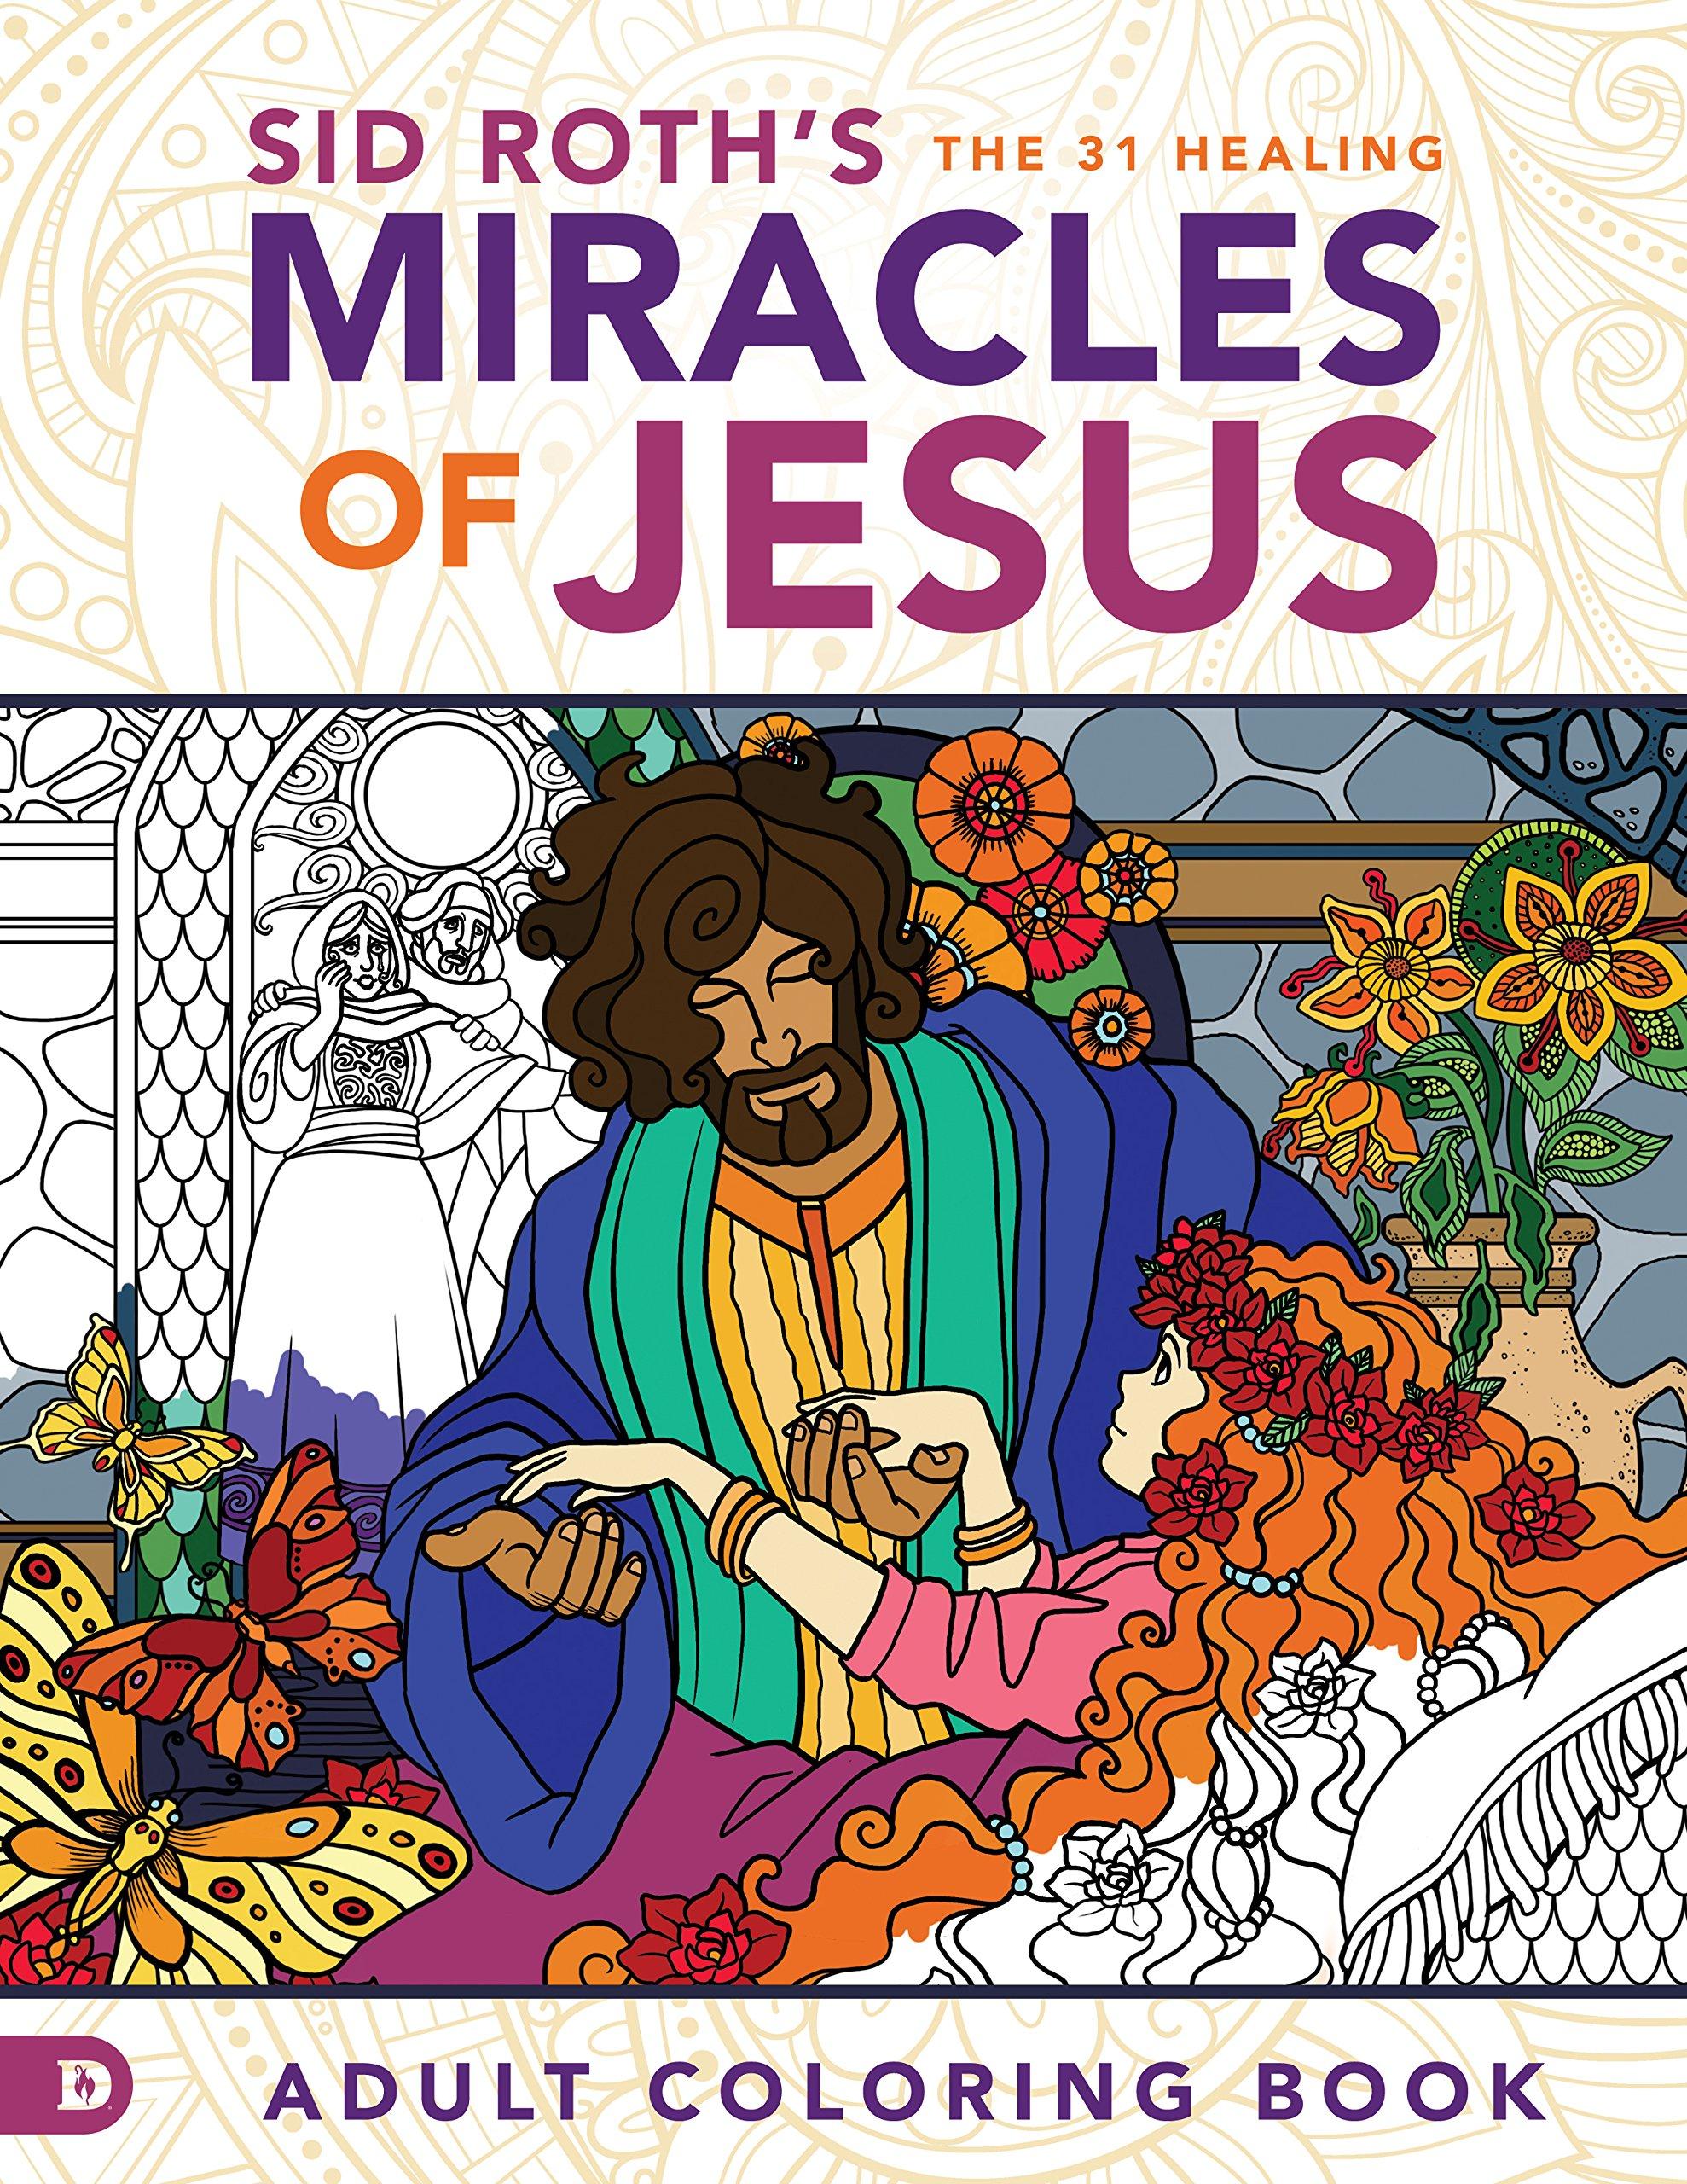 amazon com sid roth u0027s the 31 healing miracles of jesus based on